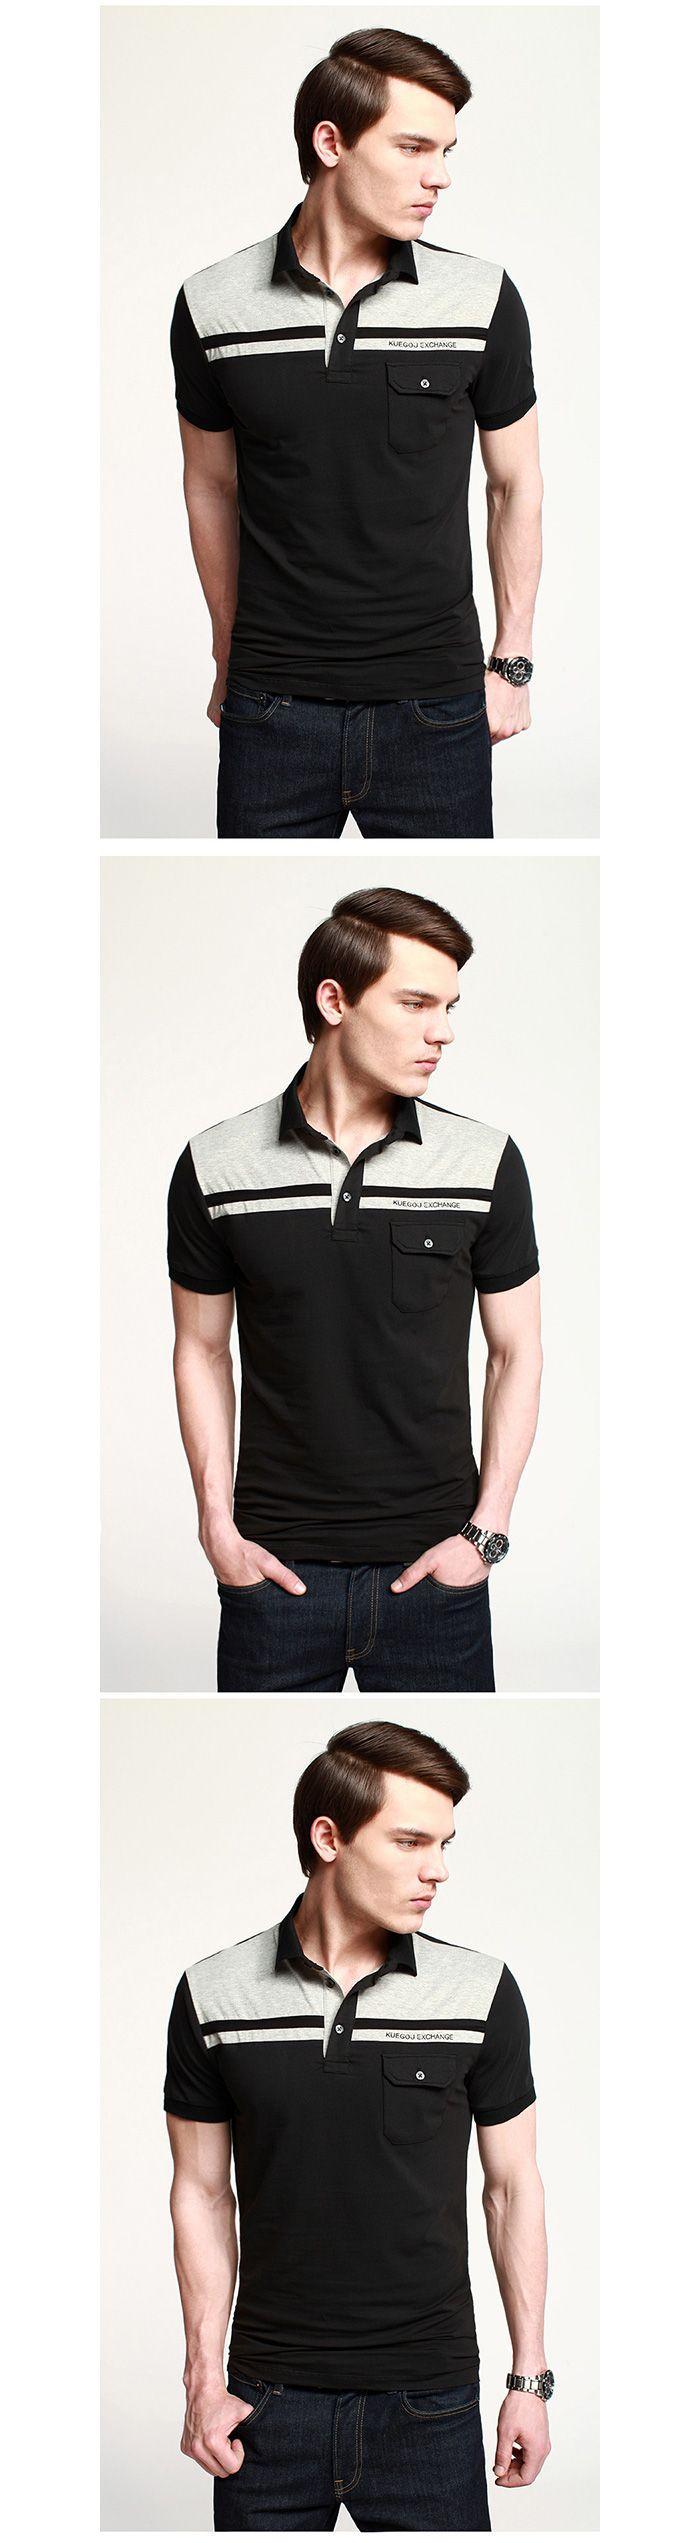 Classic Style Contrast Paneled Yoke Single Pocket Trim Polo Shirt For Men, Shop online for $27.50 Cheap Polo Shirts code 700315 - Eastclothes.com